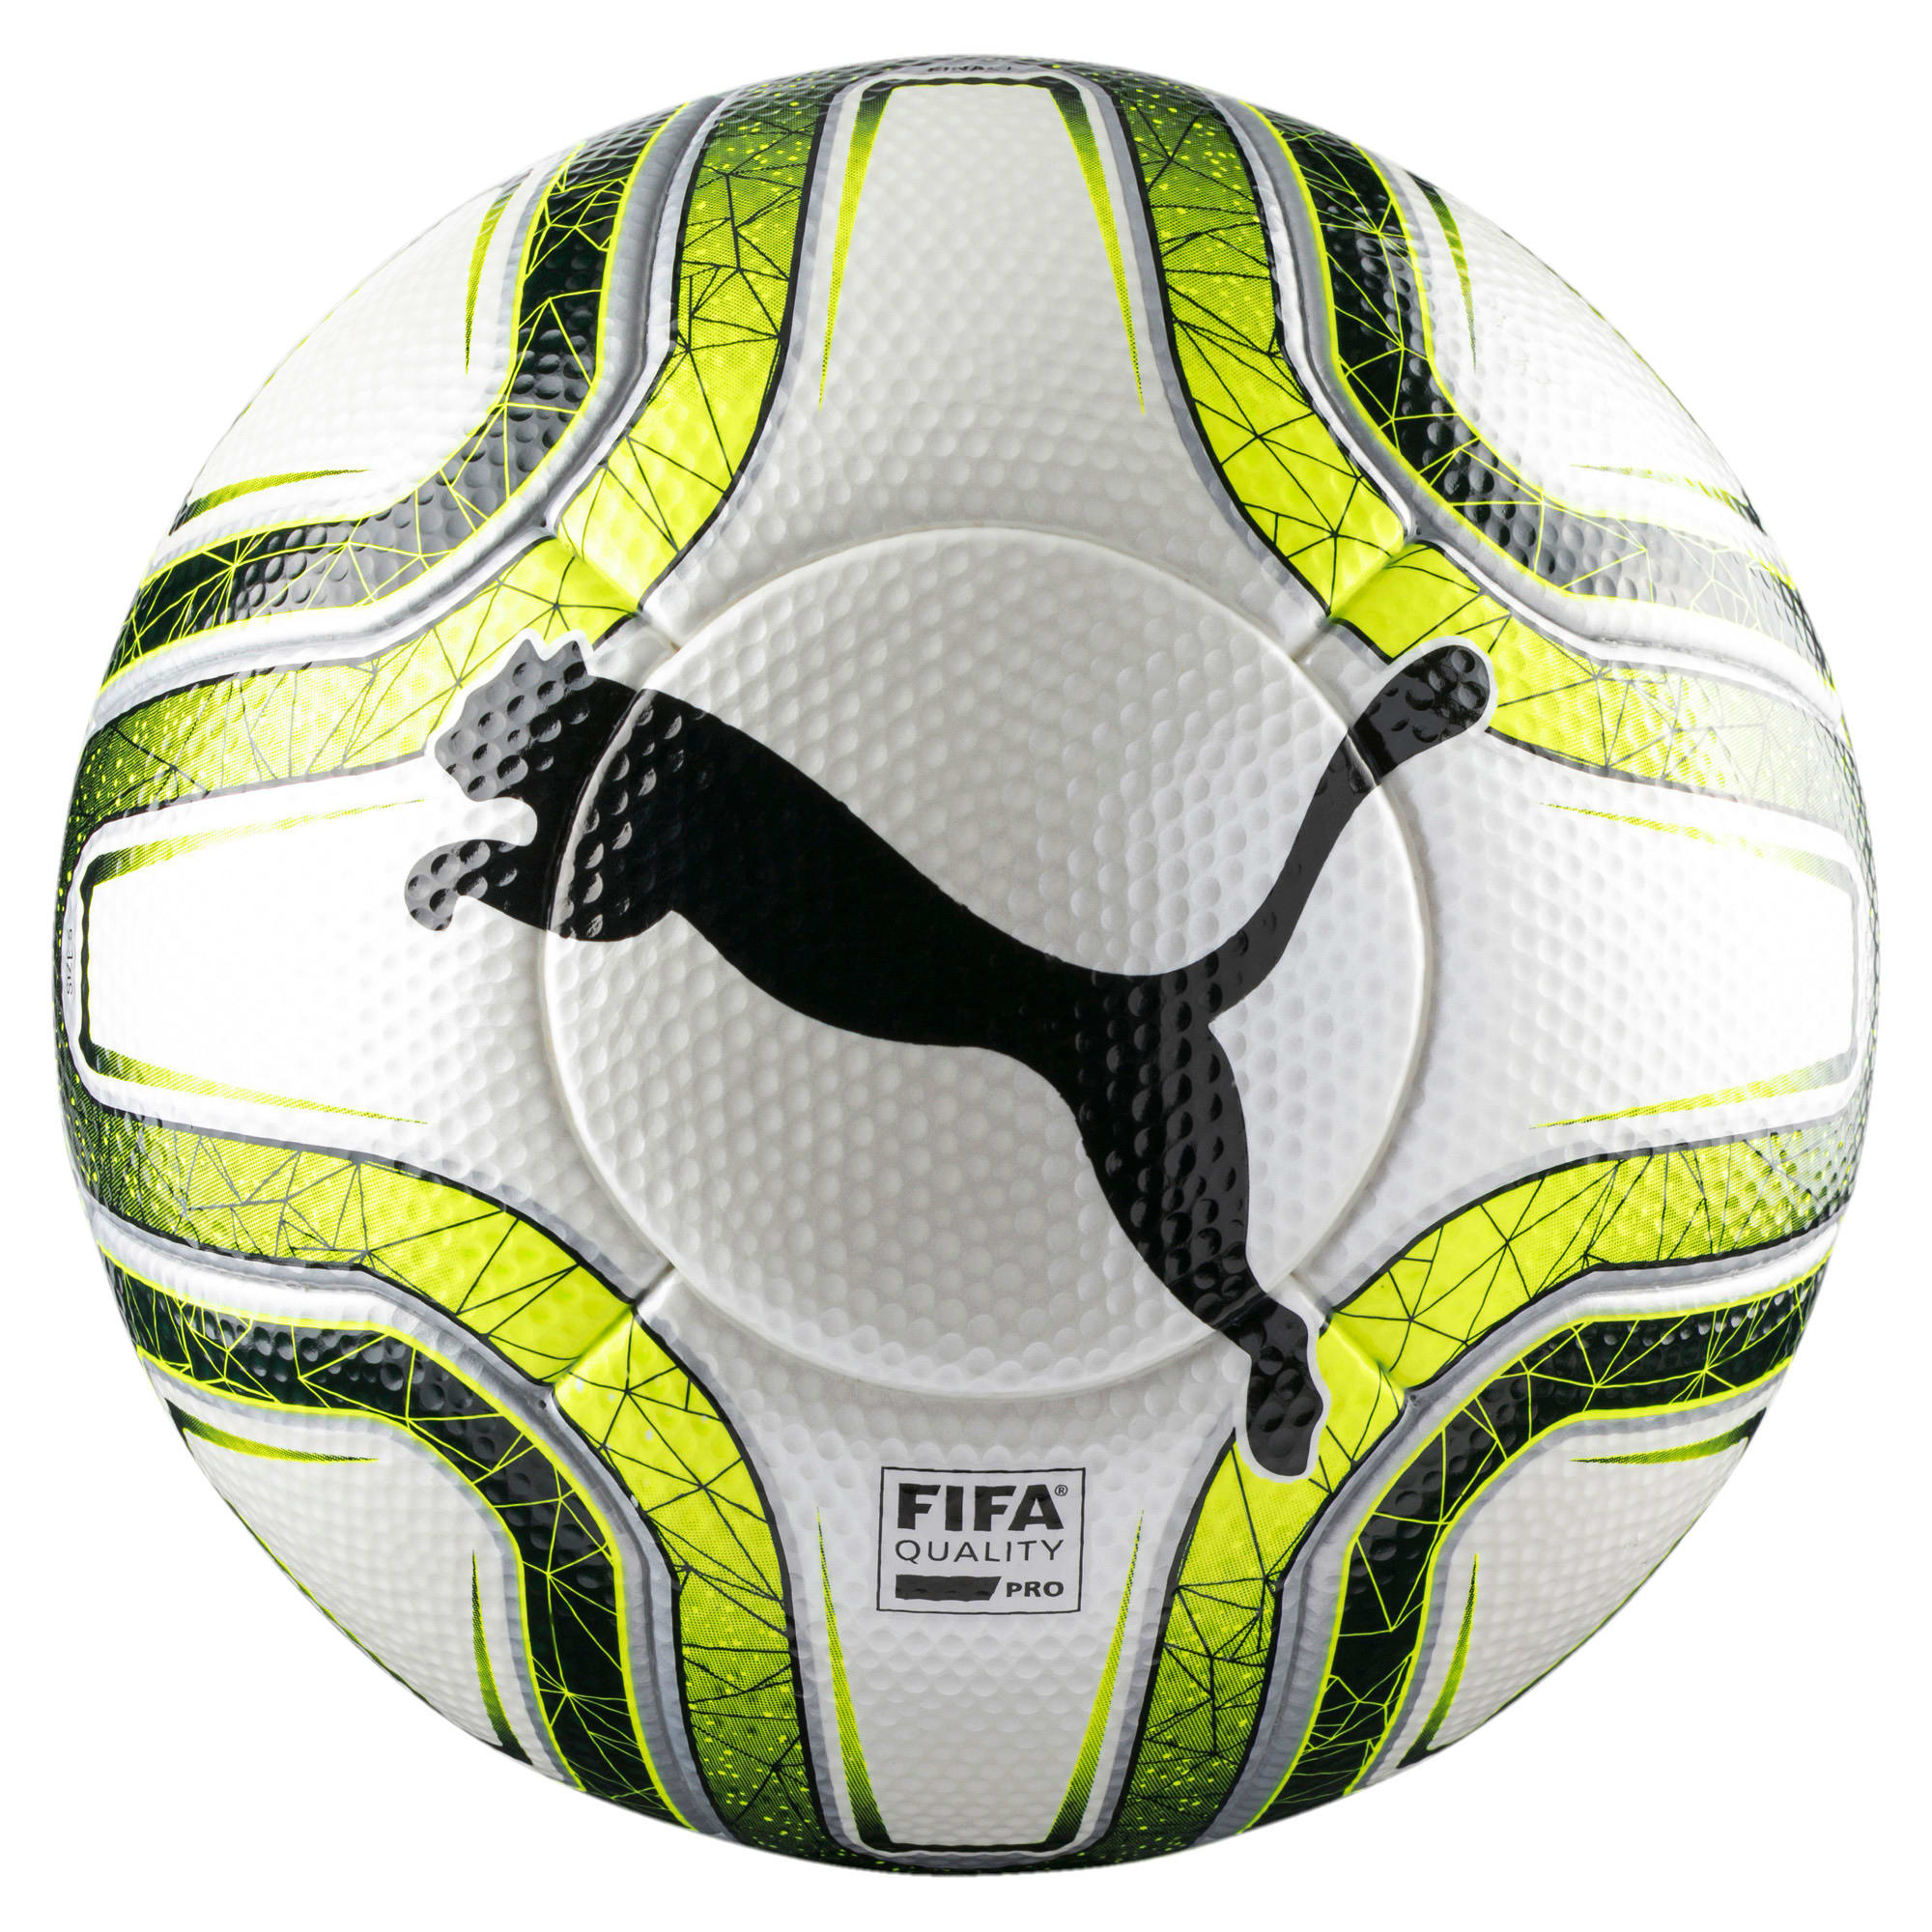 Thumbnail 1 of FINAL 1 Statement FIFA Q Pro Match Soccer, White-Lemon Tonic-Black, medium